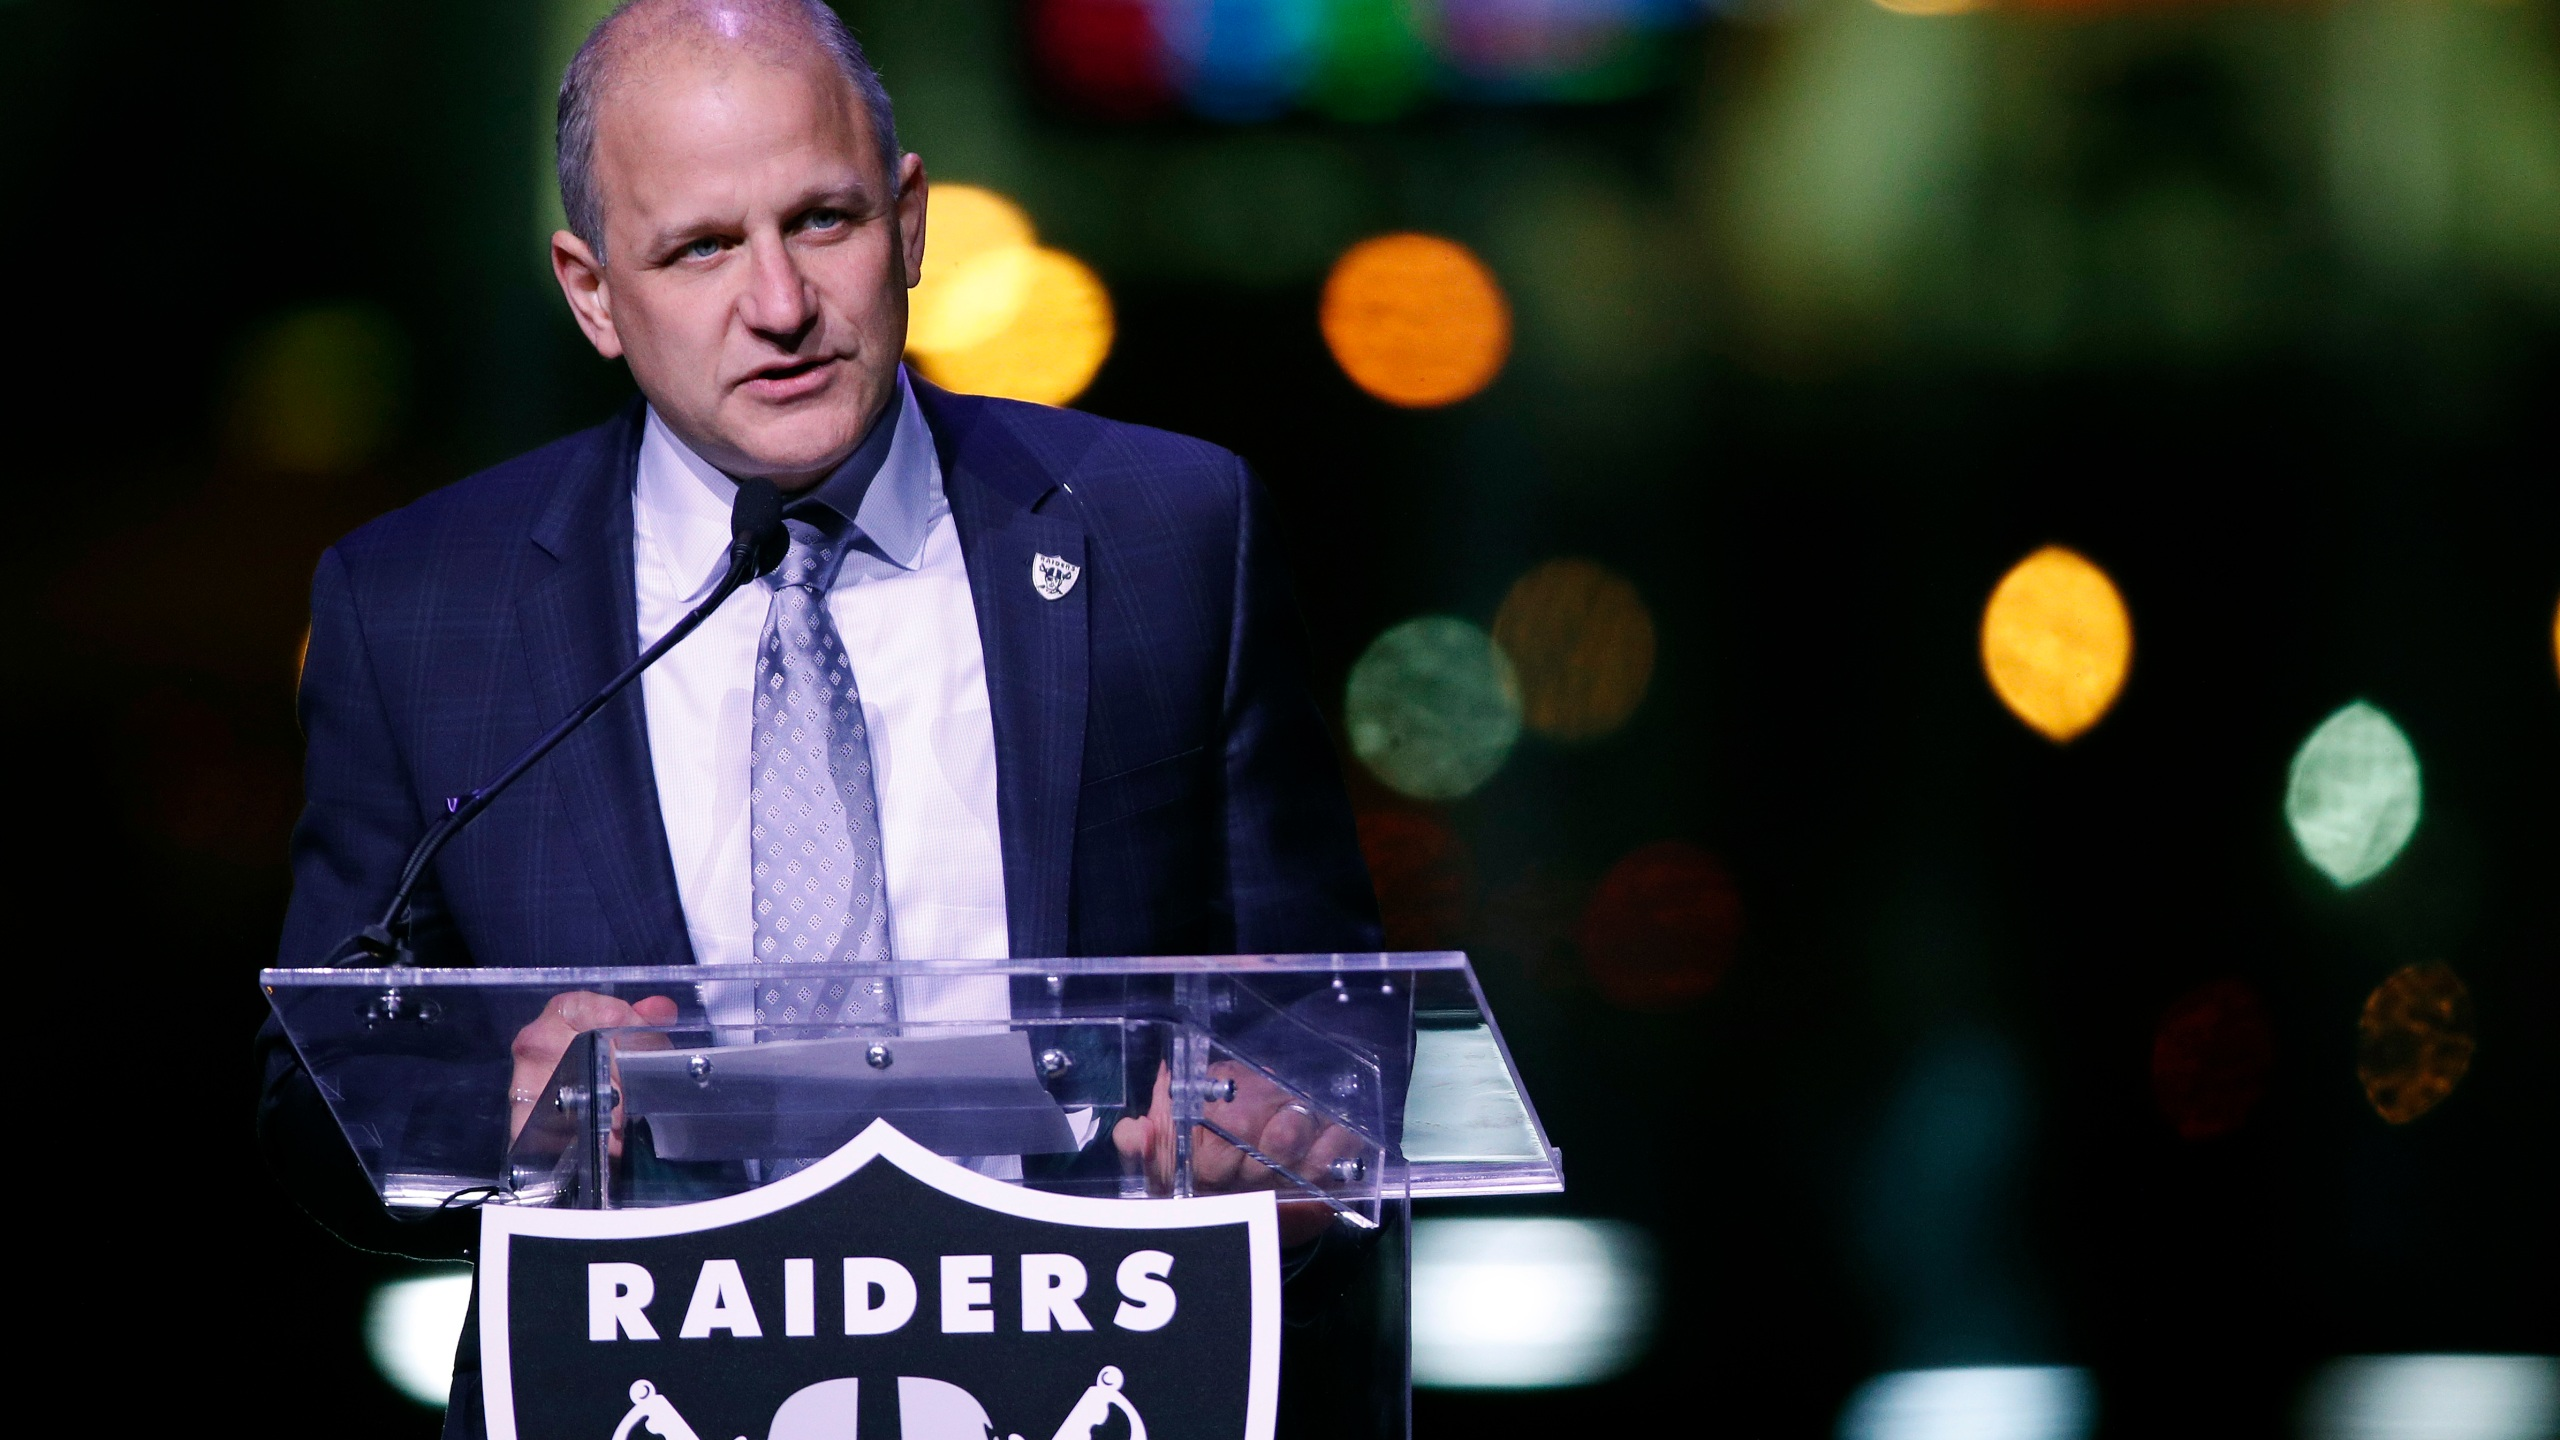 In this Nov. 13, 2017, file photo, Oakland Raiders President Marc Badain speaks during a ceremonial groundbreaking for the Raiders' stadium in Las Vegas. (AP Photo/John Locher, File)